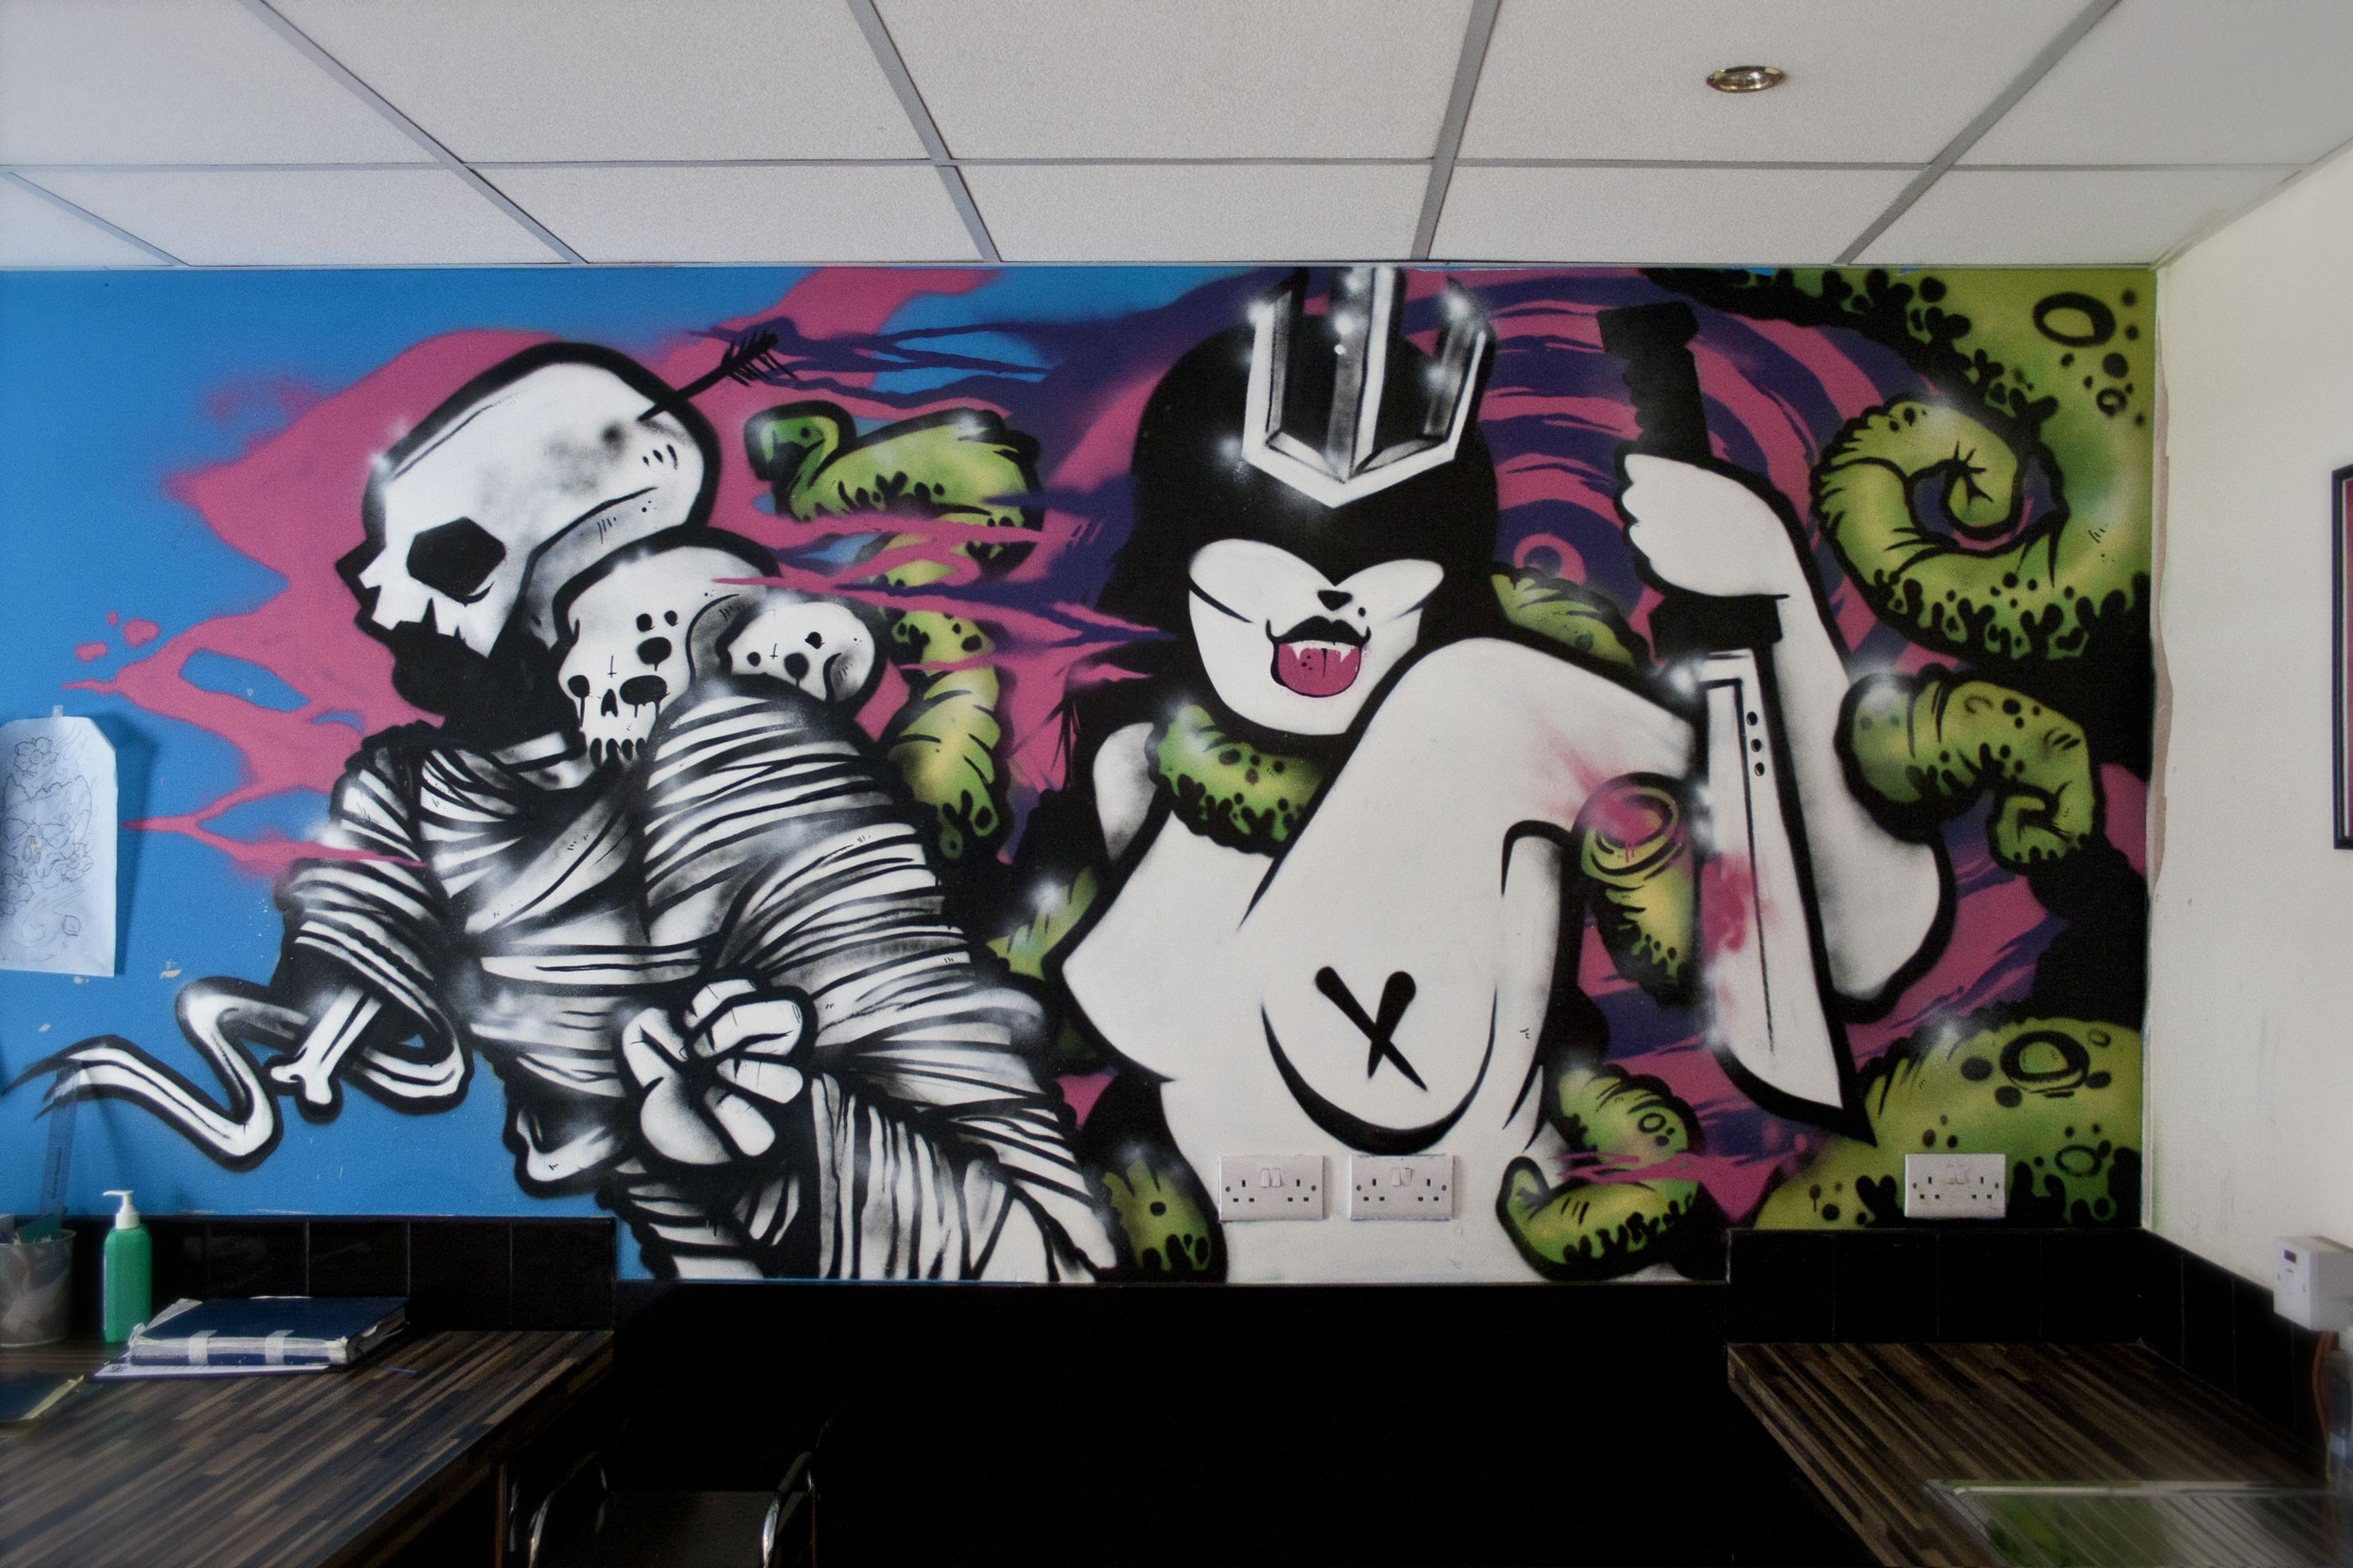 ... graffiti, street art, sheffield street art, milak, mila k, japanese  graffiti, end of the world, post apocalyptic, searching for atlantis, sea  graffiti, ...